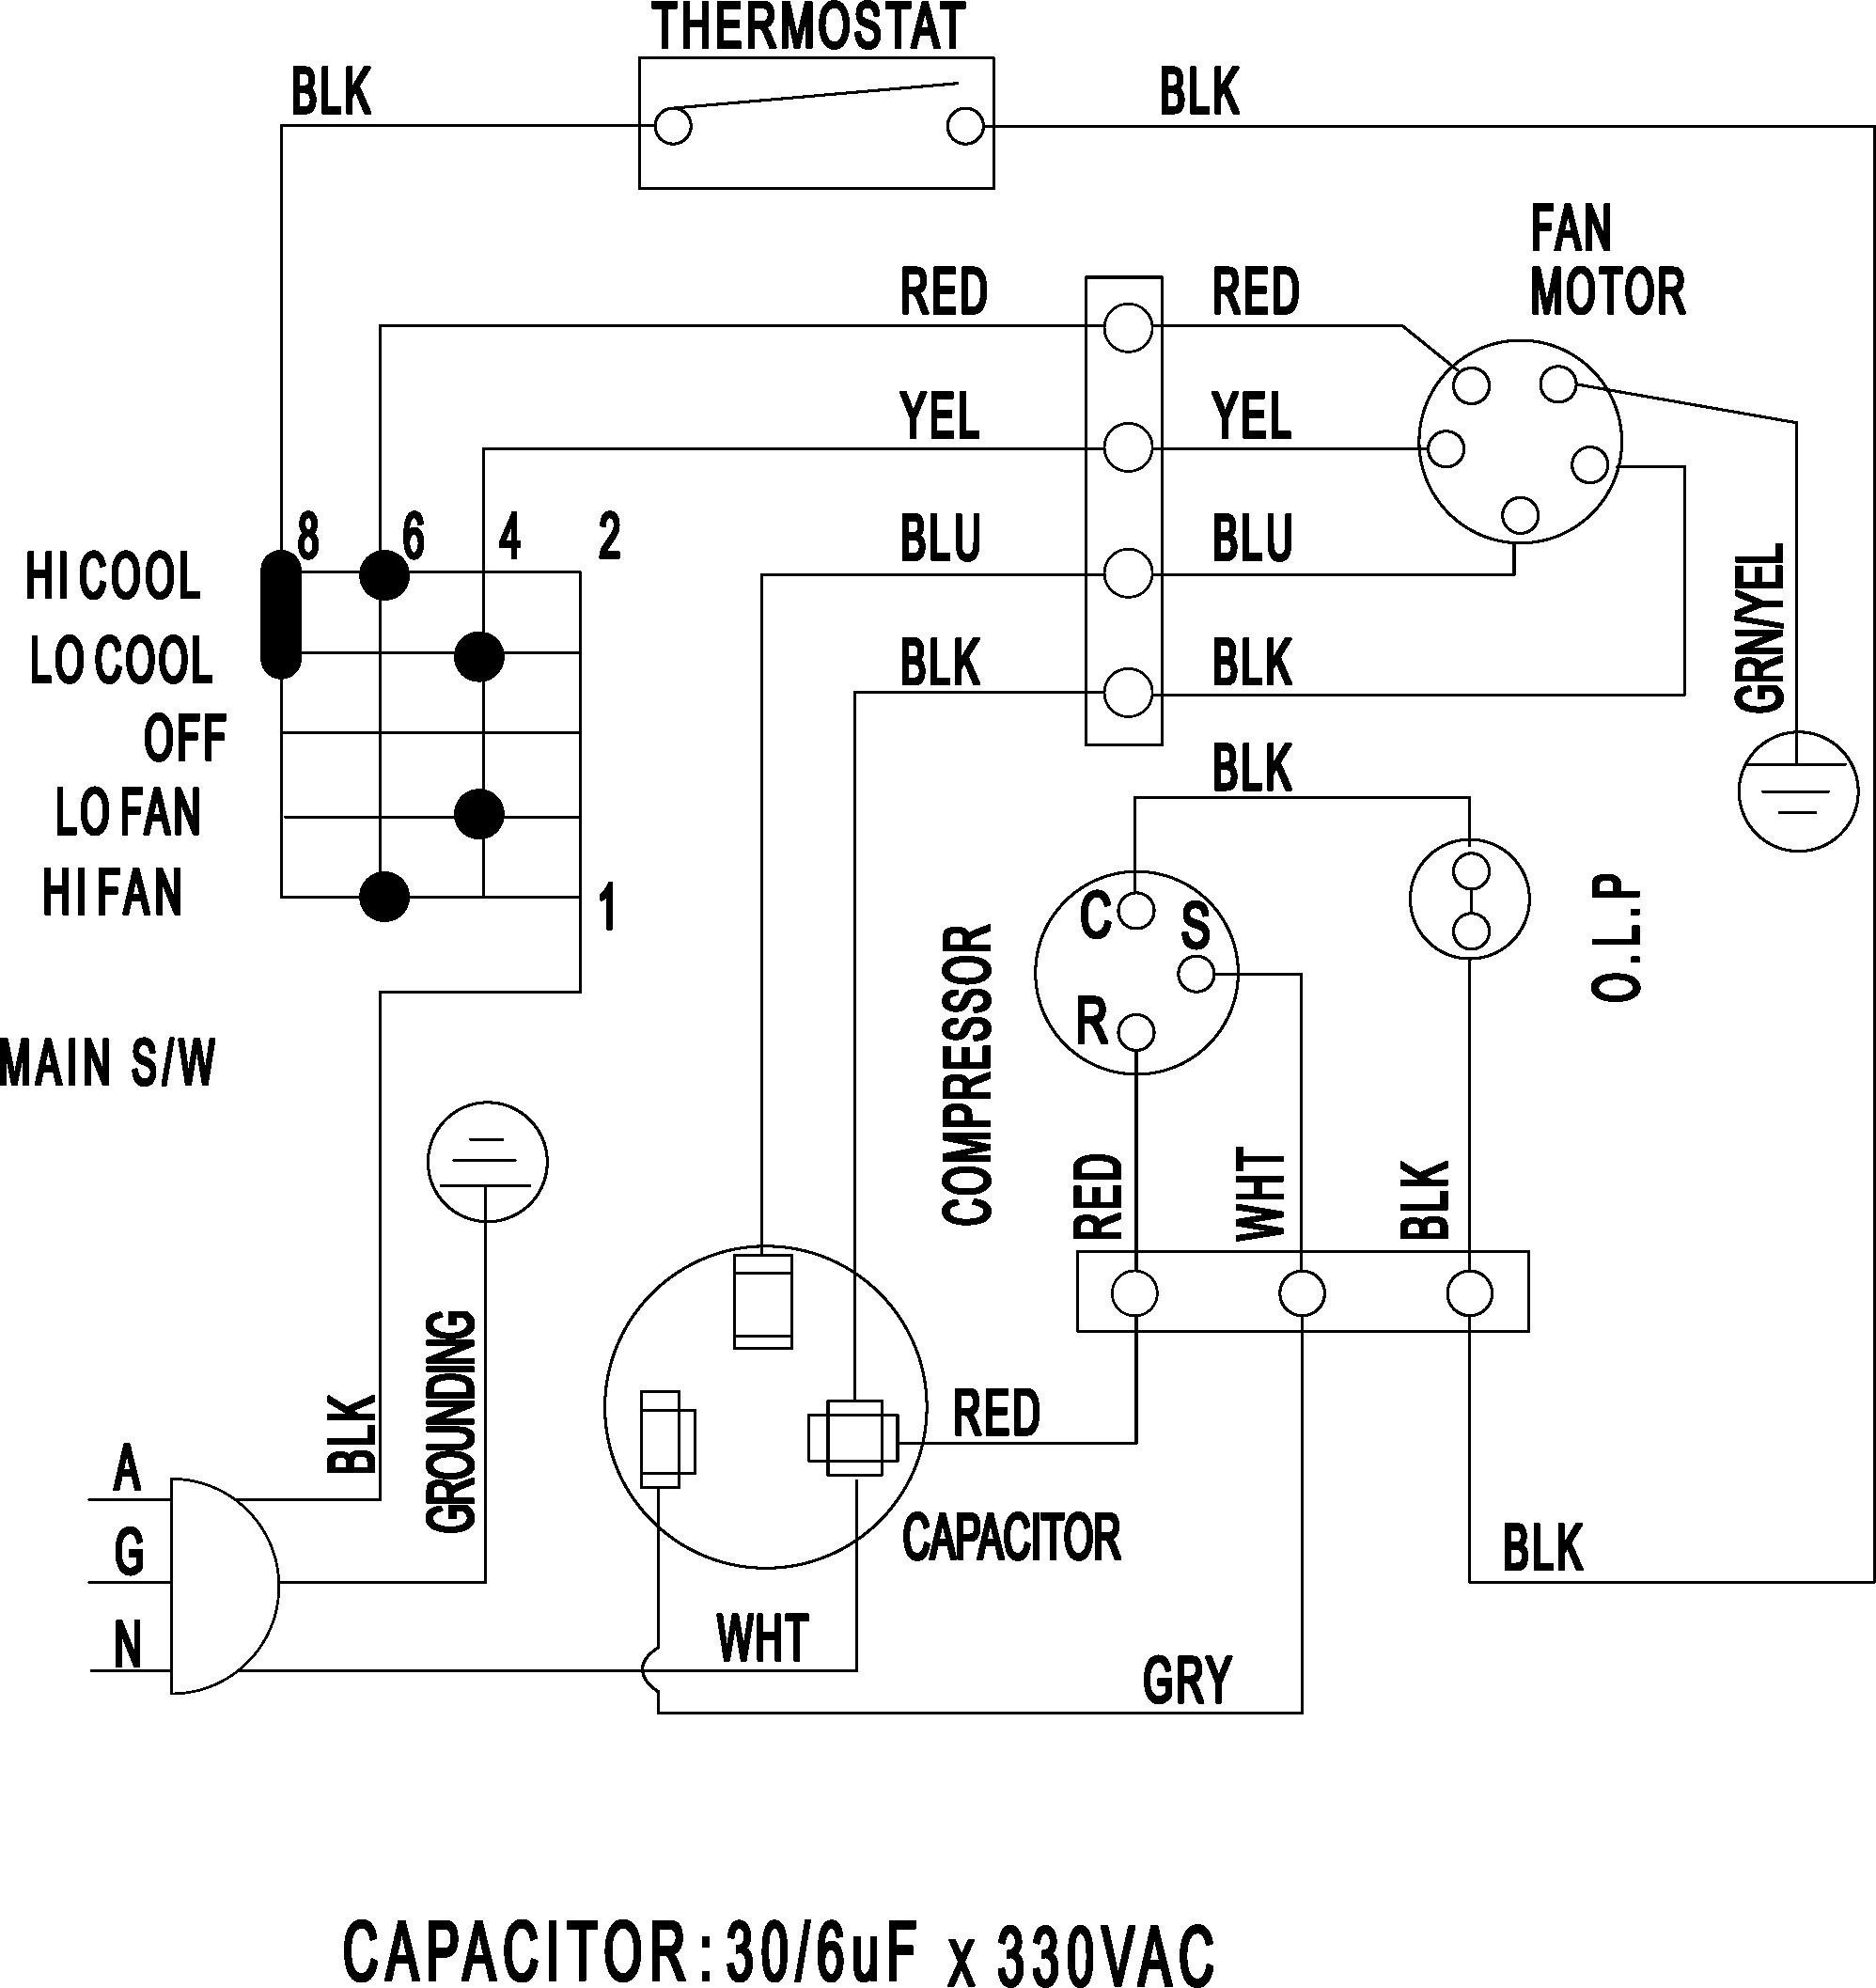 Surprising Rudd Ac Wiring Diagram Wiring Diagram Tutorial Wiring Cloud Orsalboapumohammedshrineorg